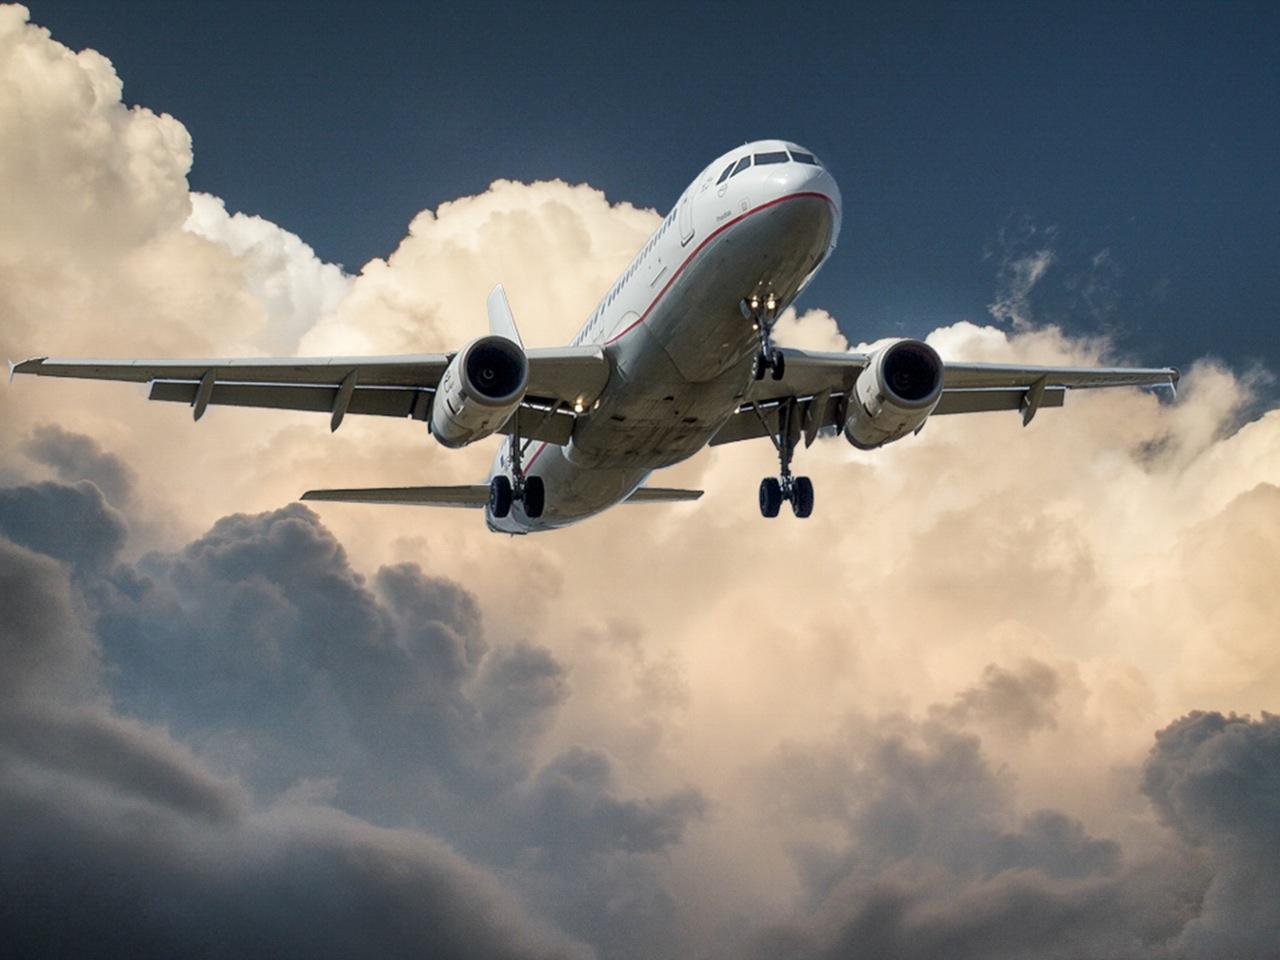 Travel hacks, sky scanner.net, save money